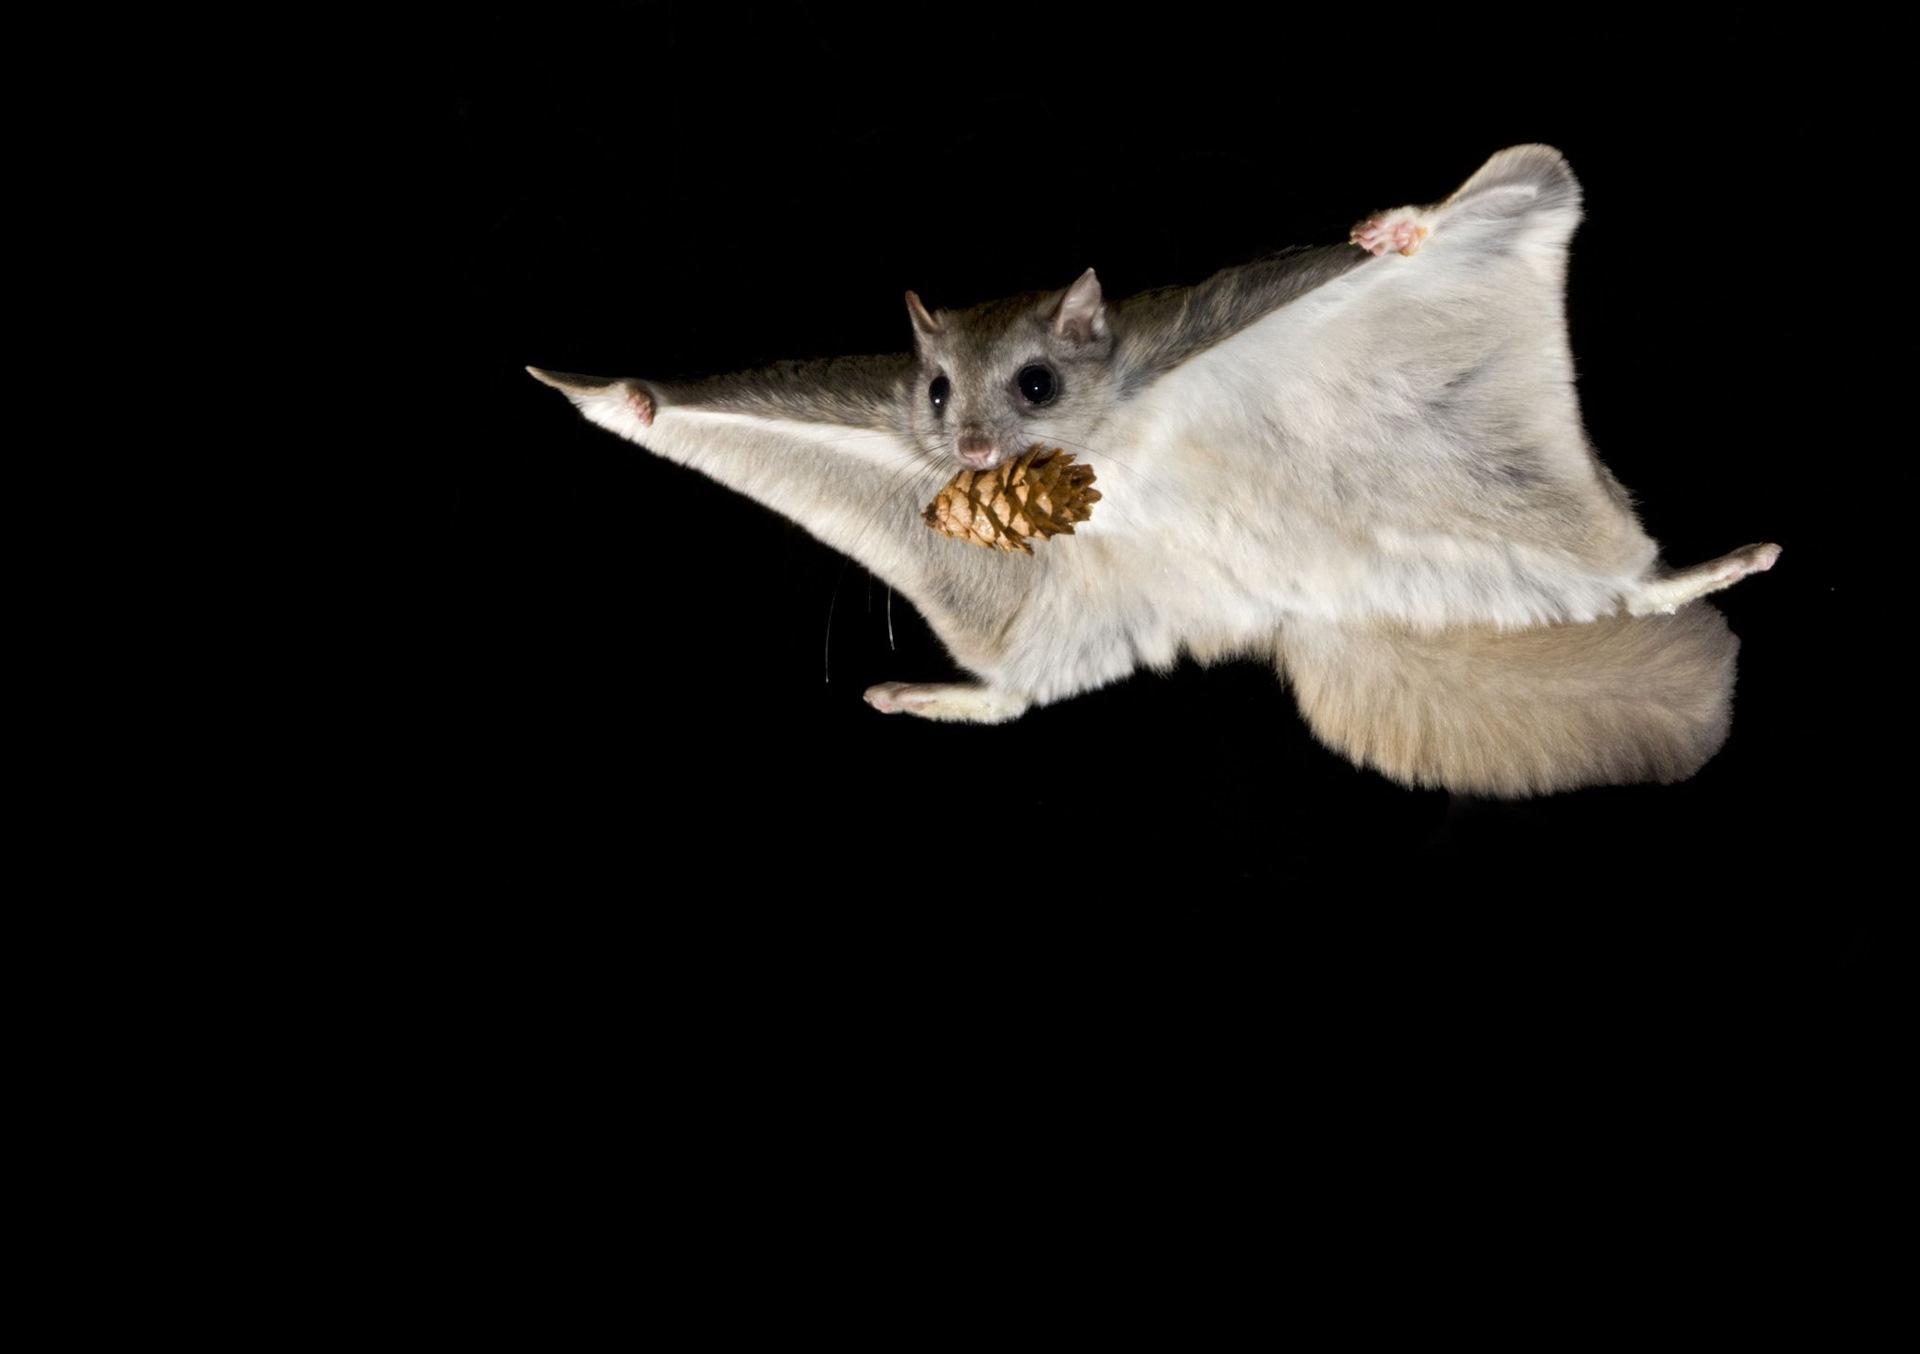 выполнен фото белка летяга в полете подложка